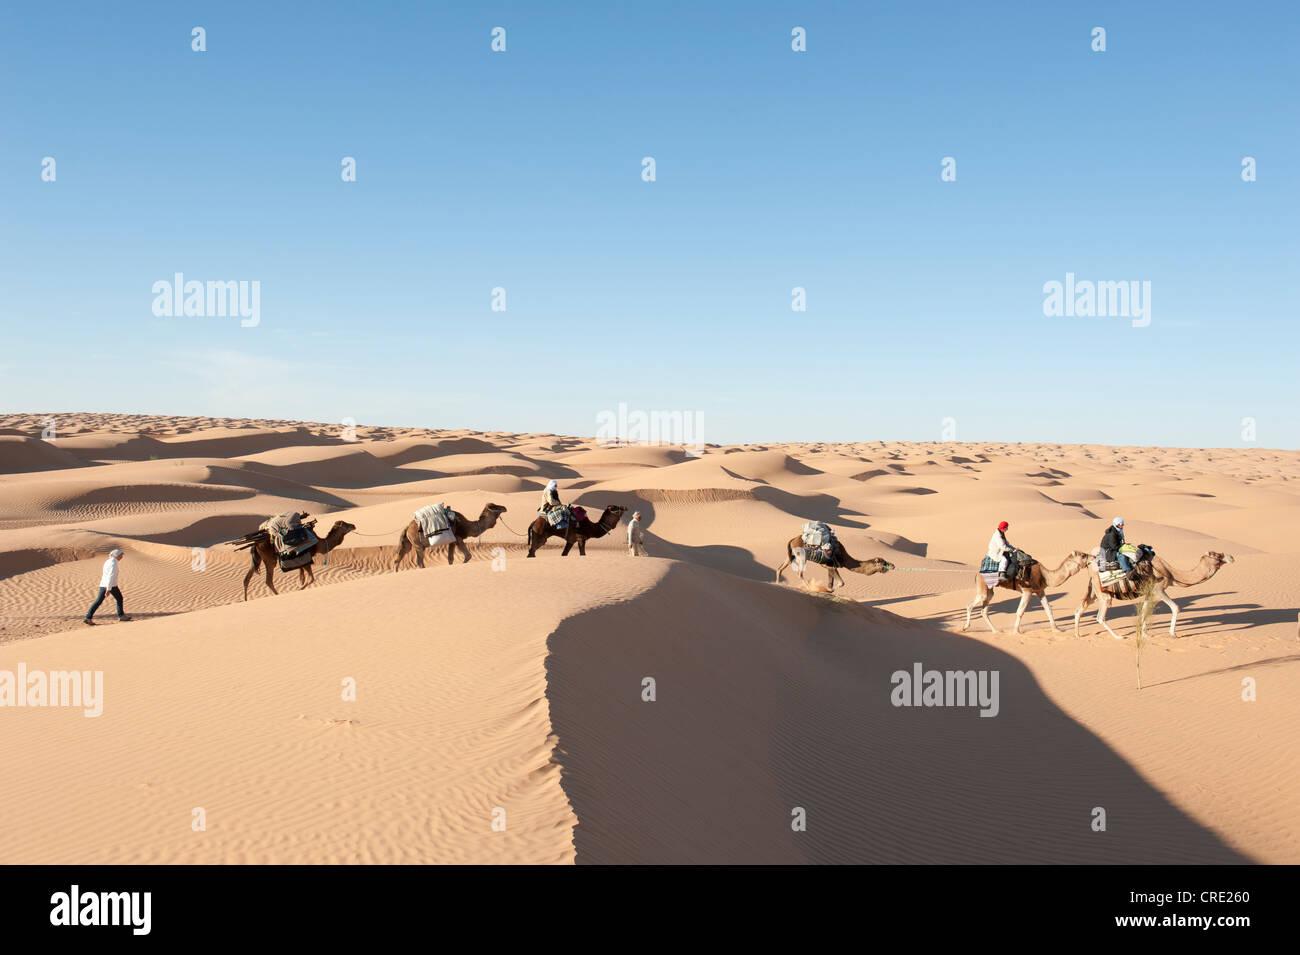 Nachhaltiger Tourismus, Kameltrekking, Kamele, Dromedare (Camelus Dromedarius), Sanddünen der Wüste Sahara Stockbild